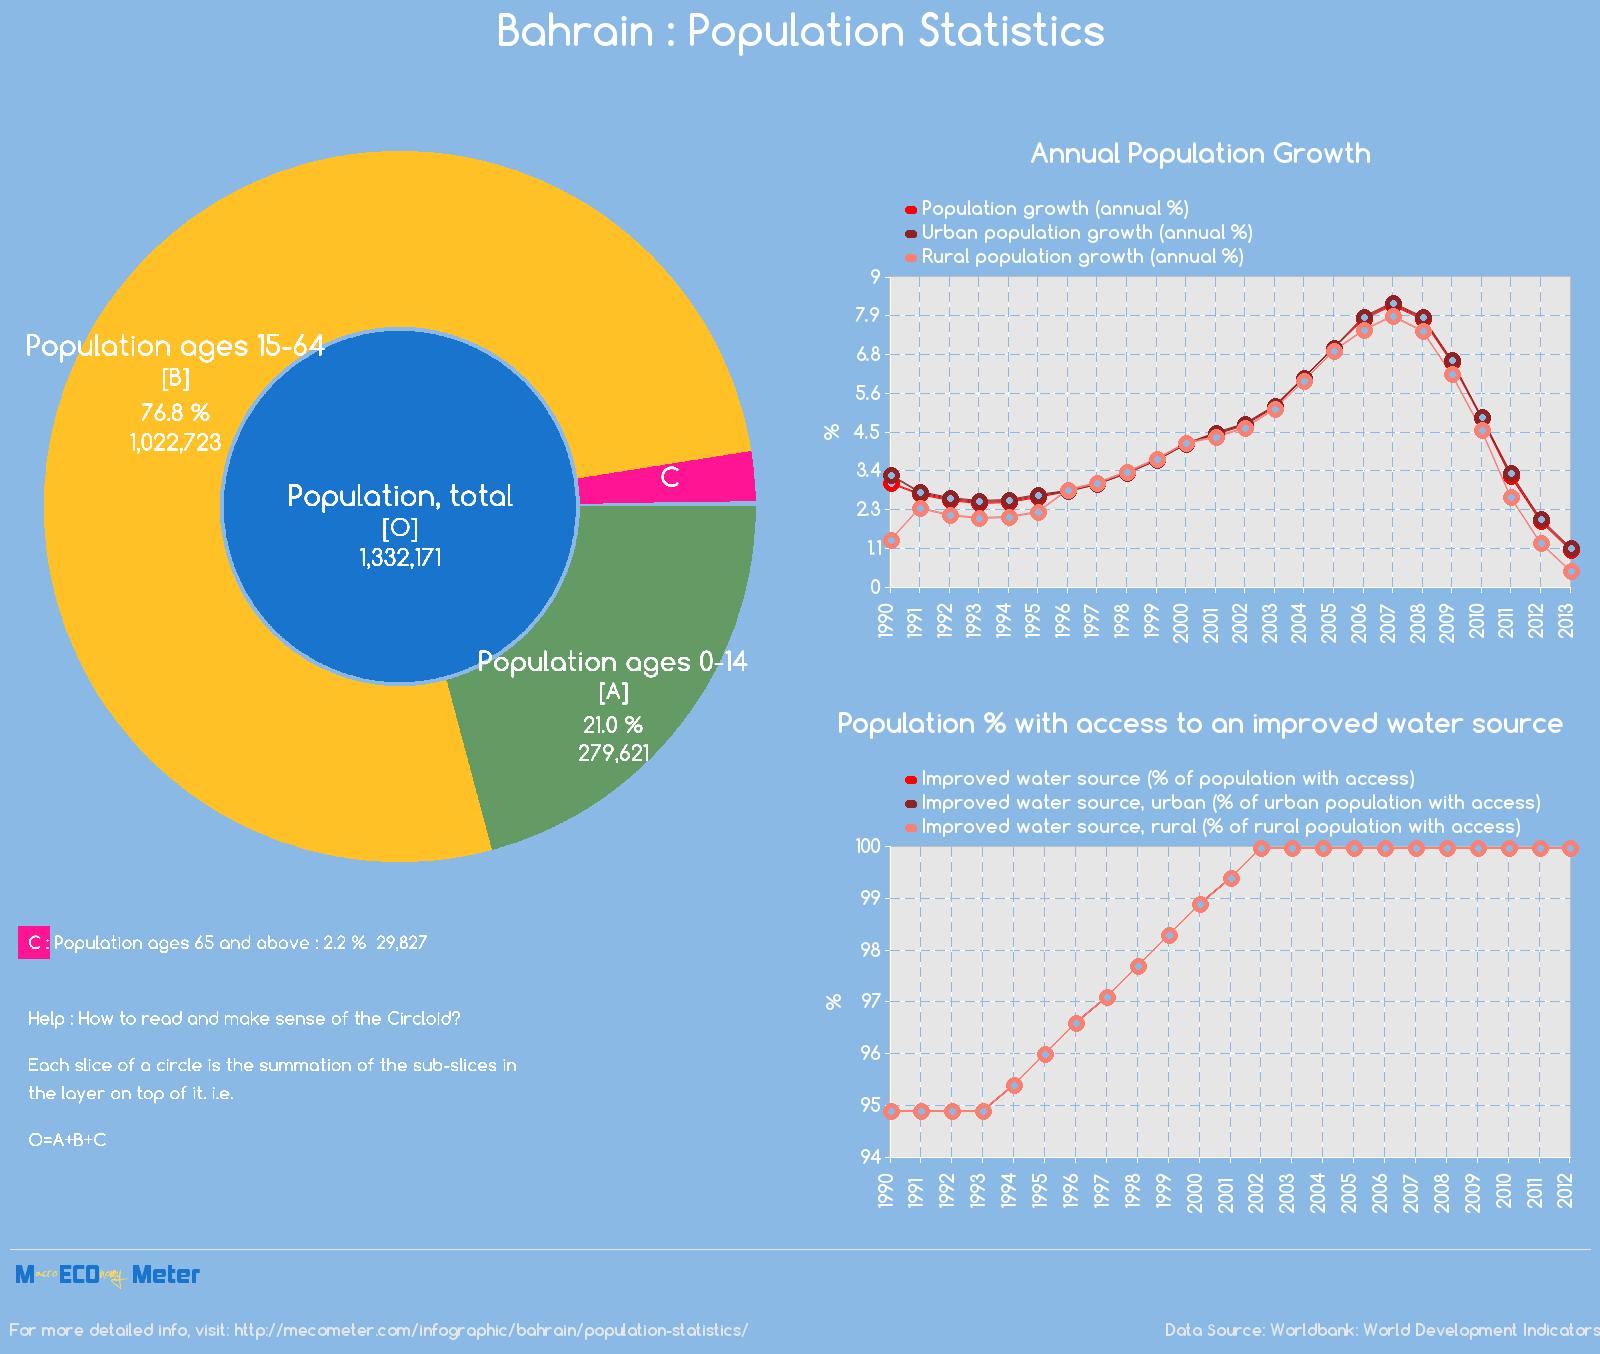 Bahrain : Population Statistics